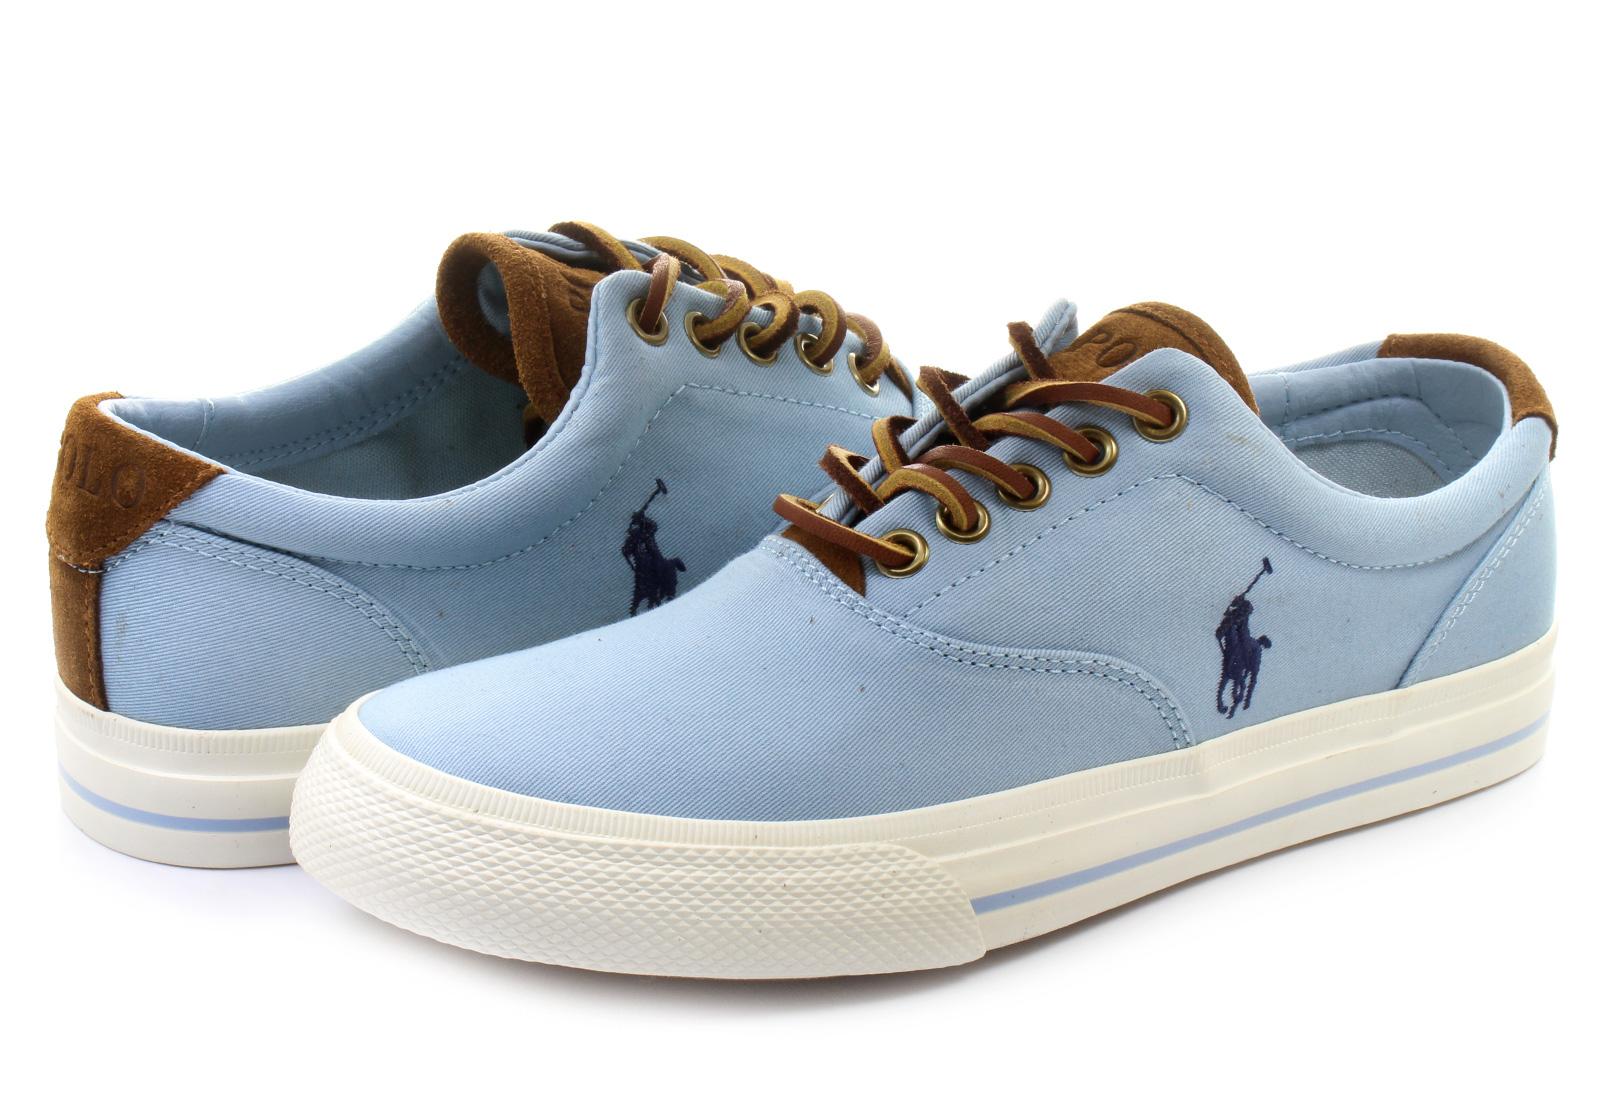 Polo Black Boat Shoes